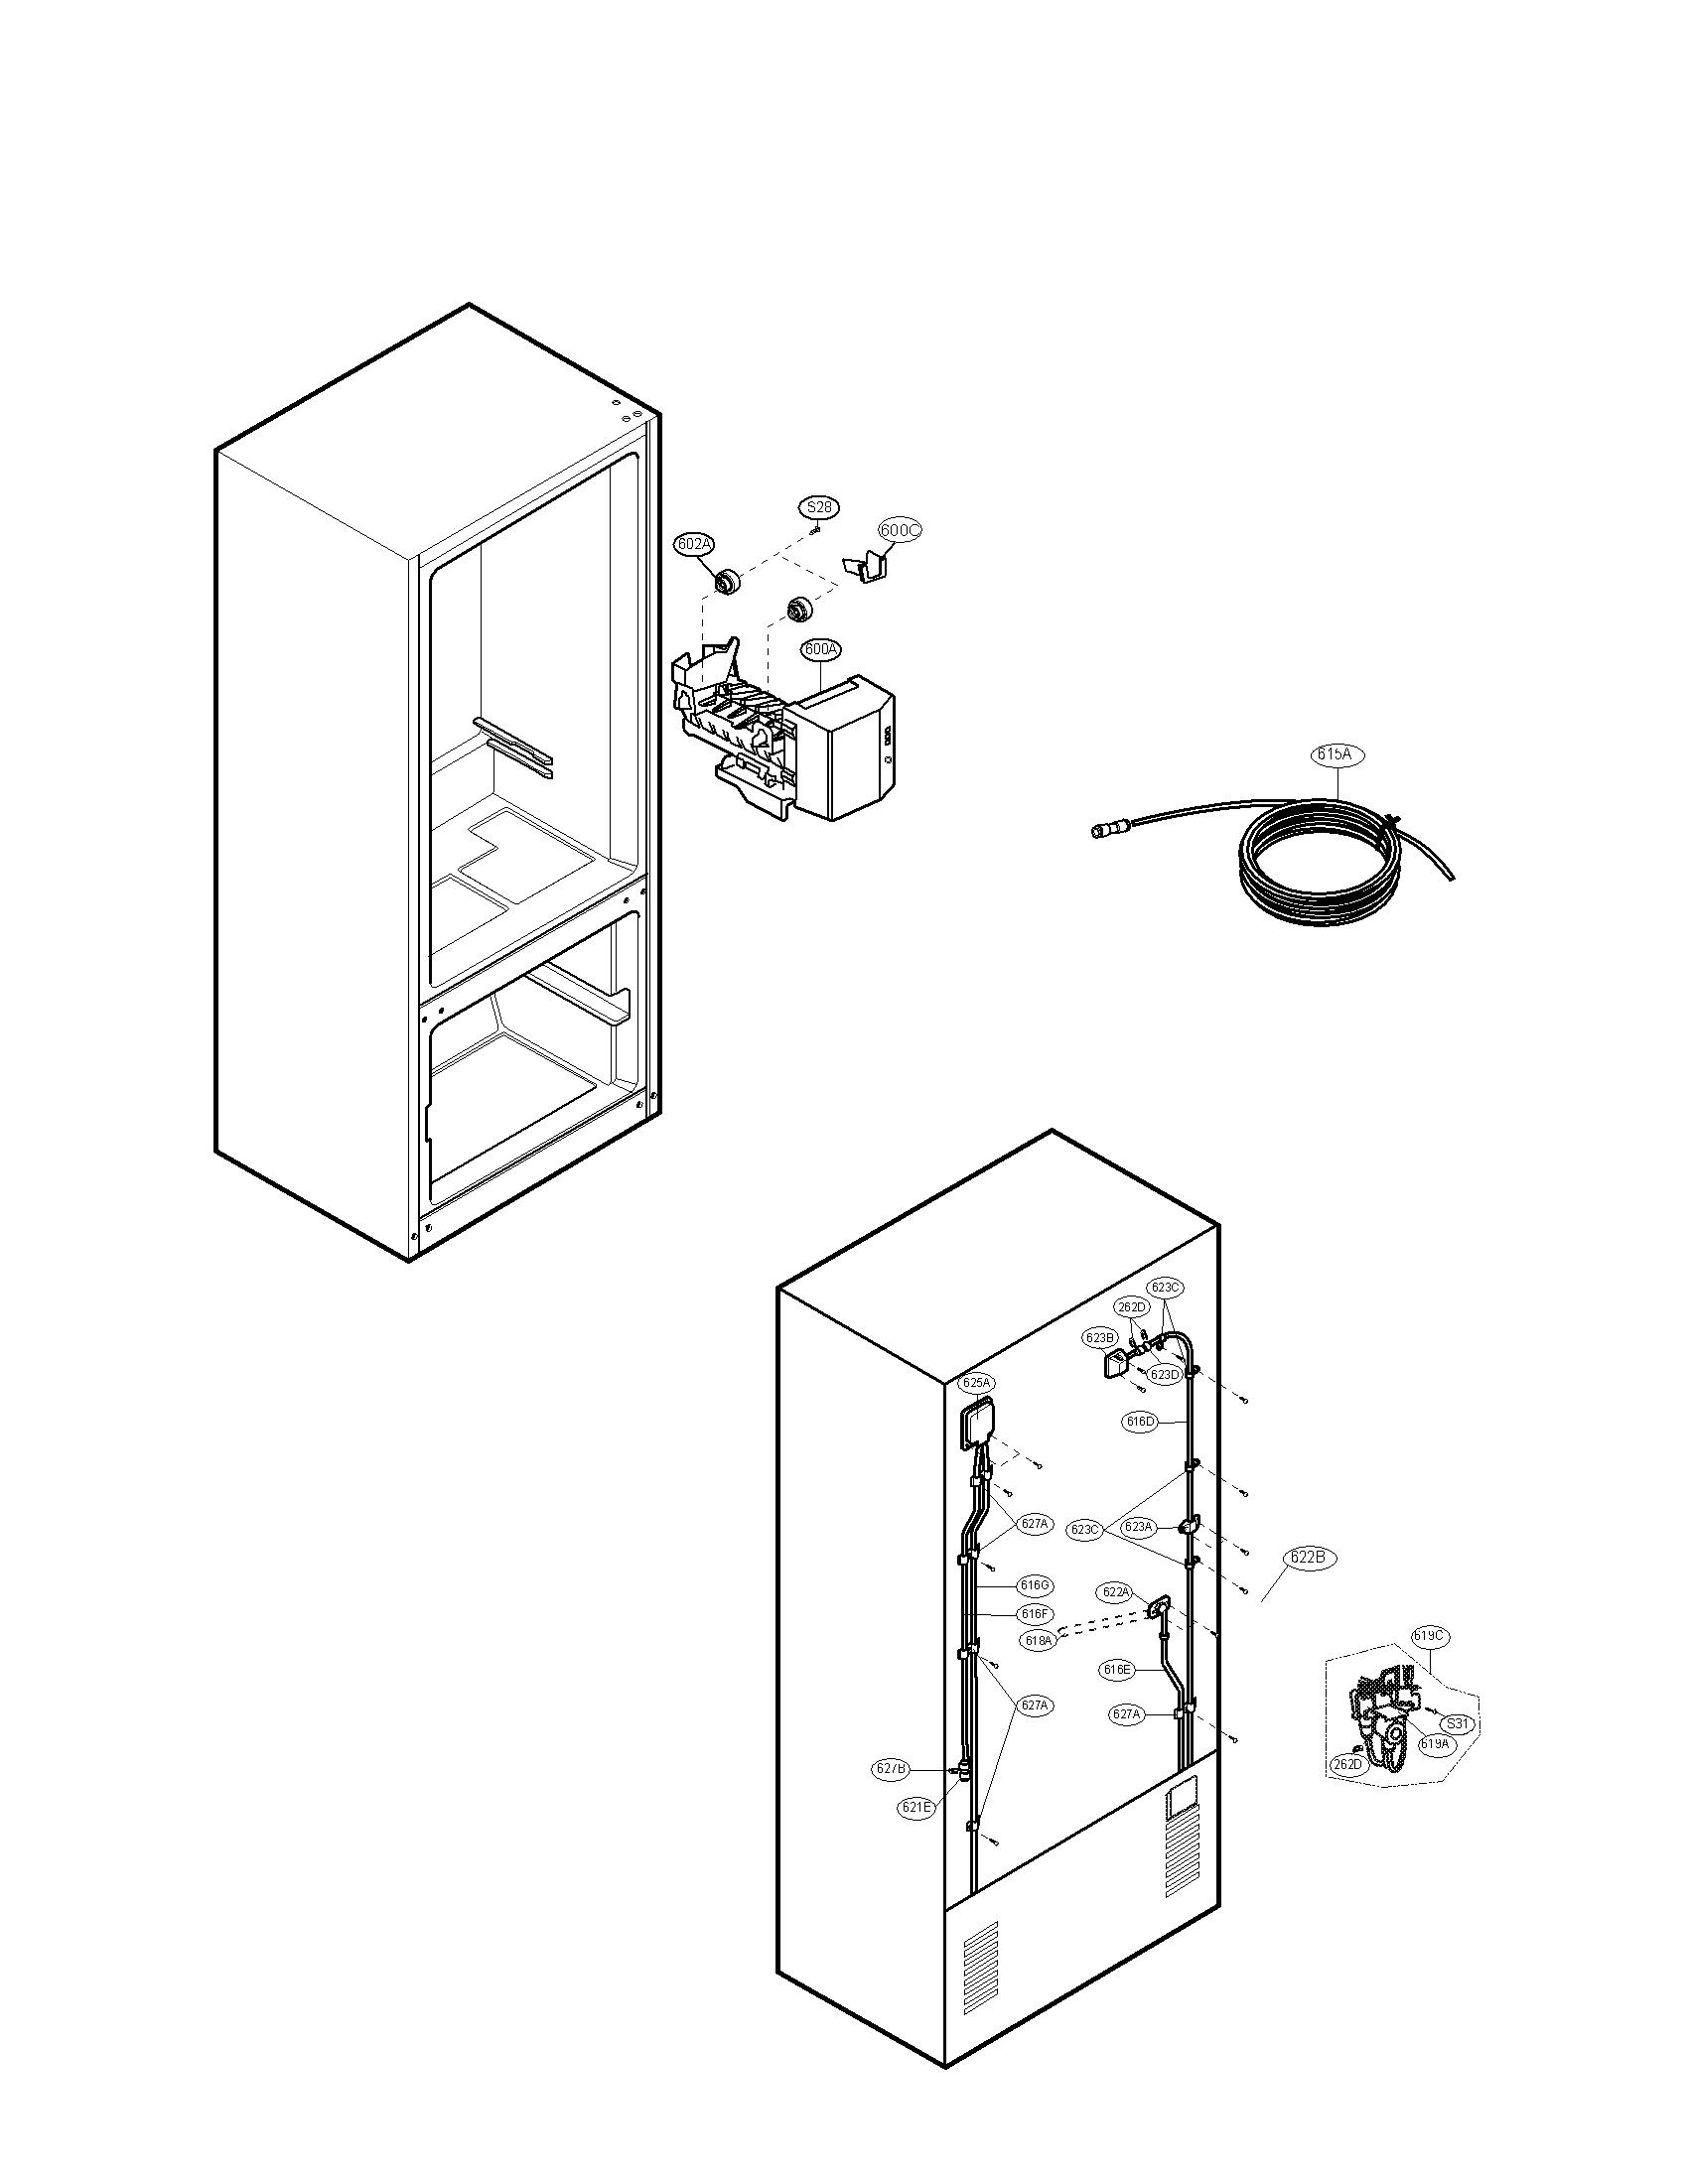 Kenmore-Elite model 79577249601 bottom-mount refrigerator